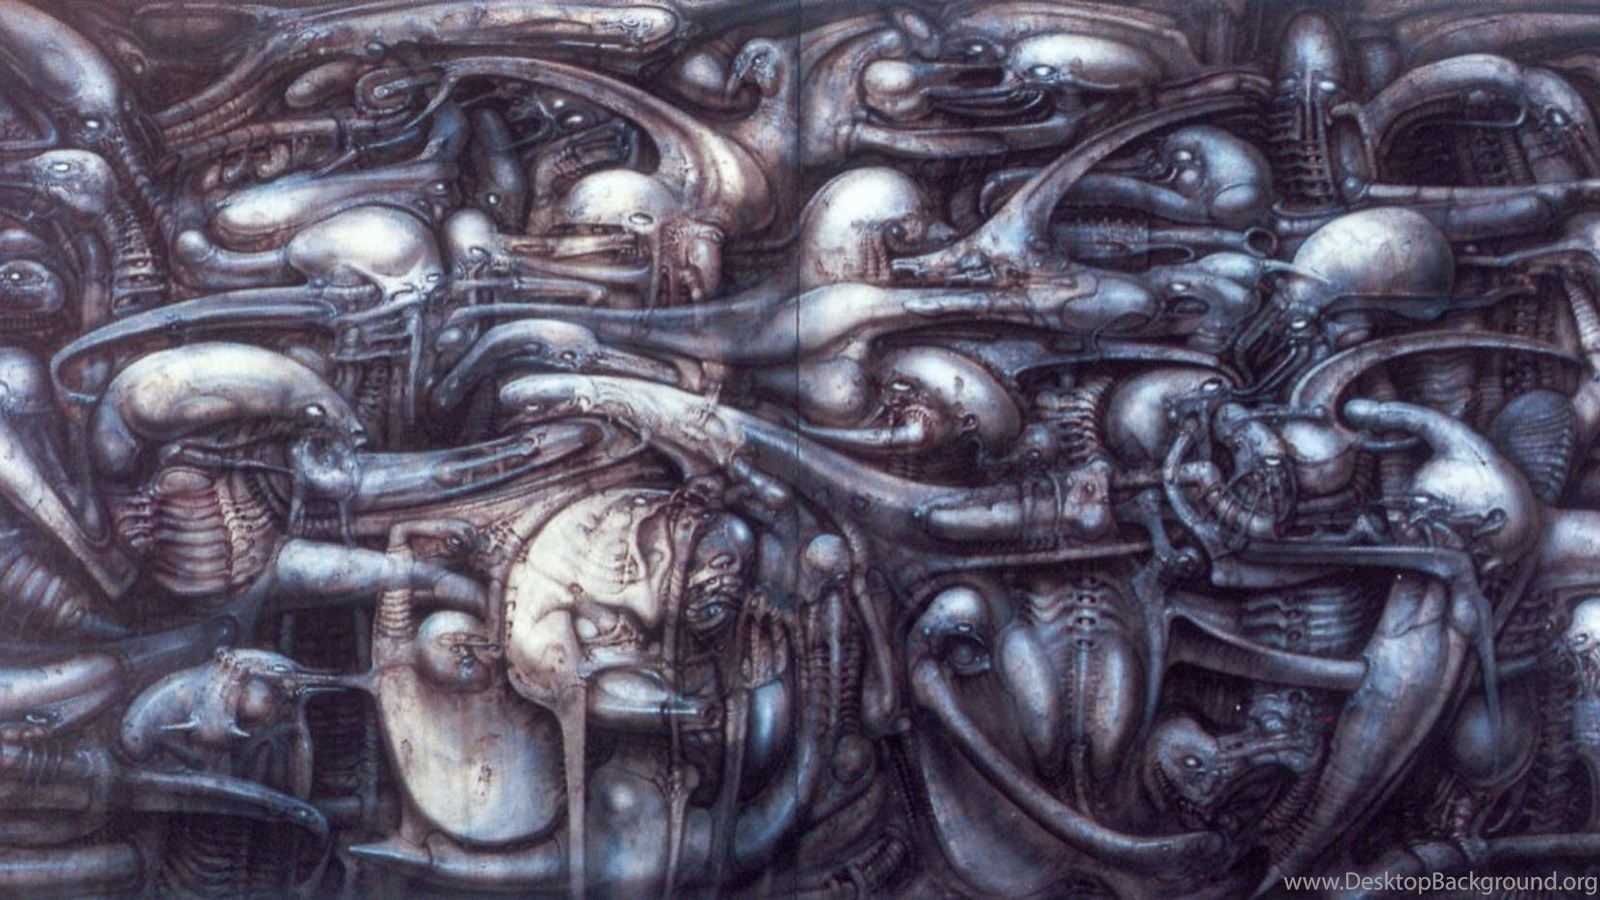 Landscape Xxvii Science Fiction H R Giger Wallpapers Image ... H.r. Giger Wallpaper